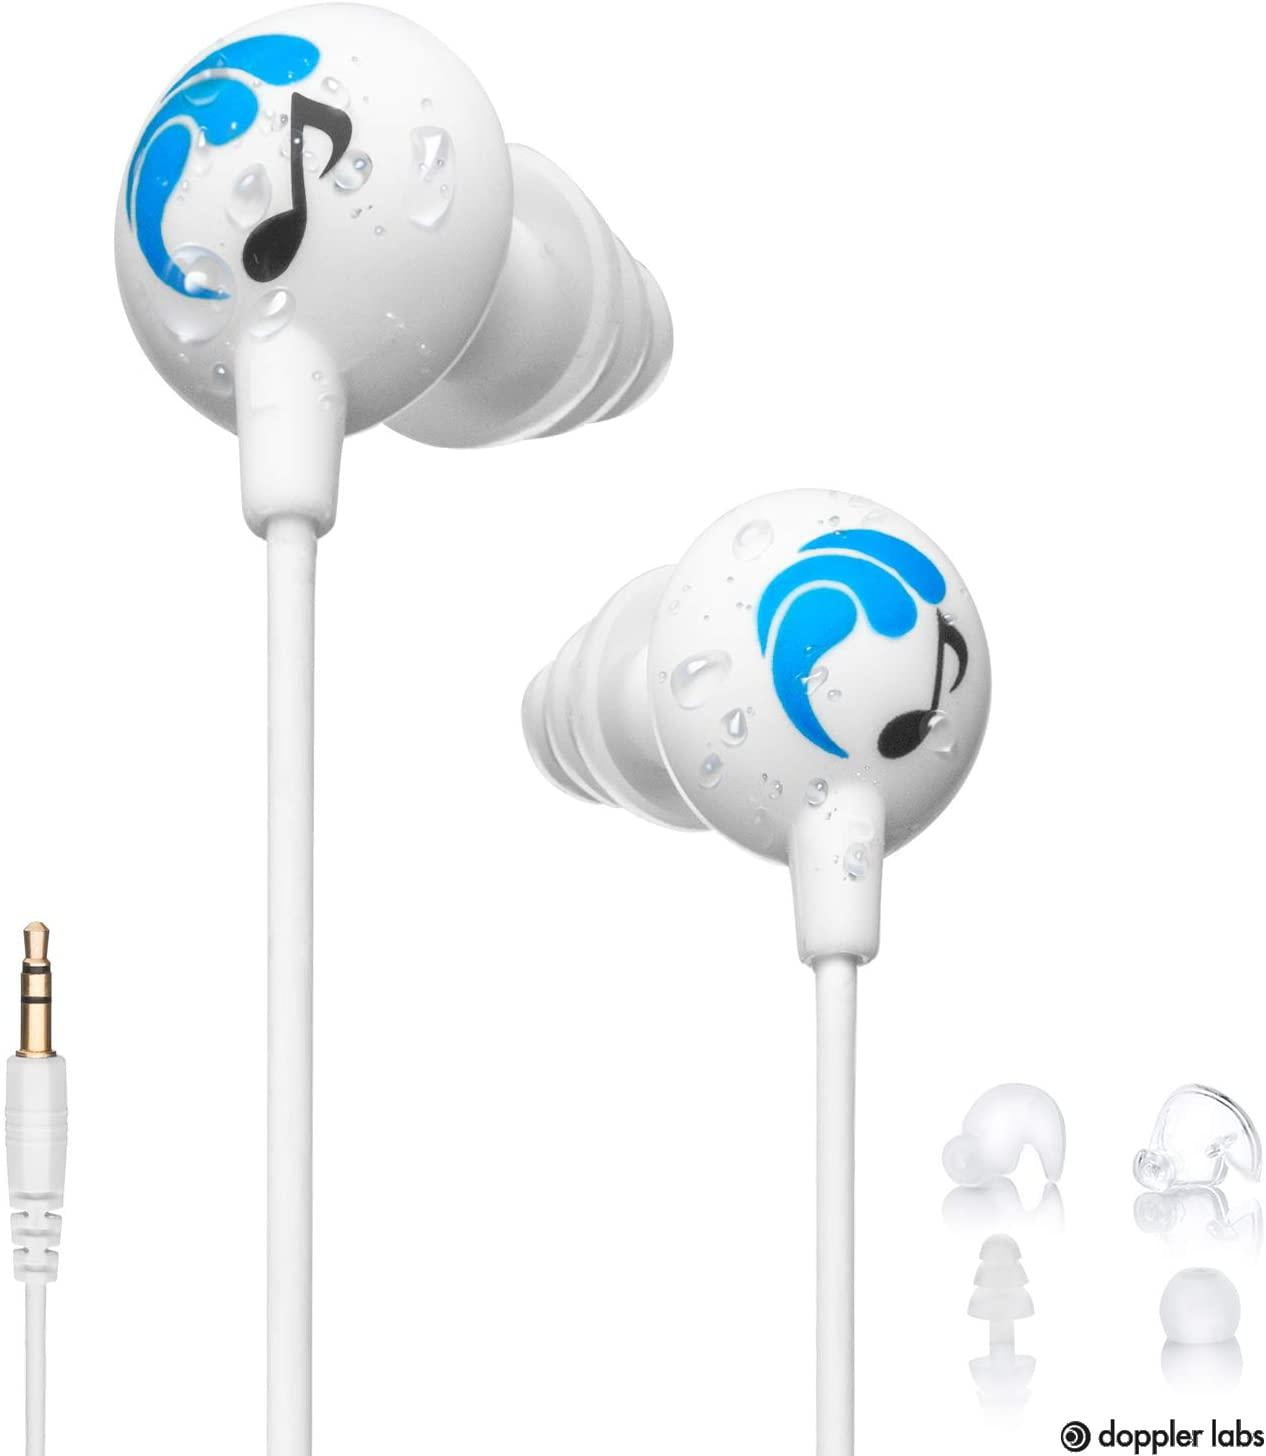 Swimbuds Sports Premium Waterproof Headphones